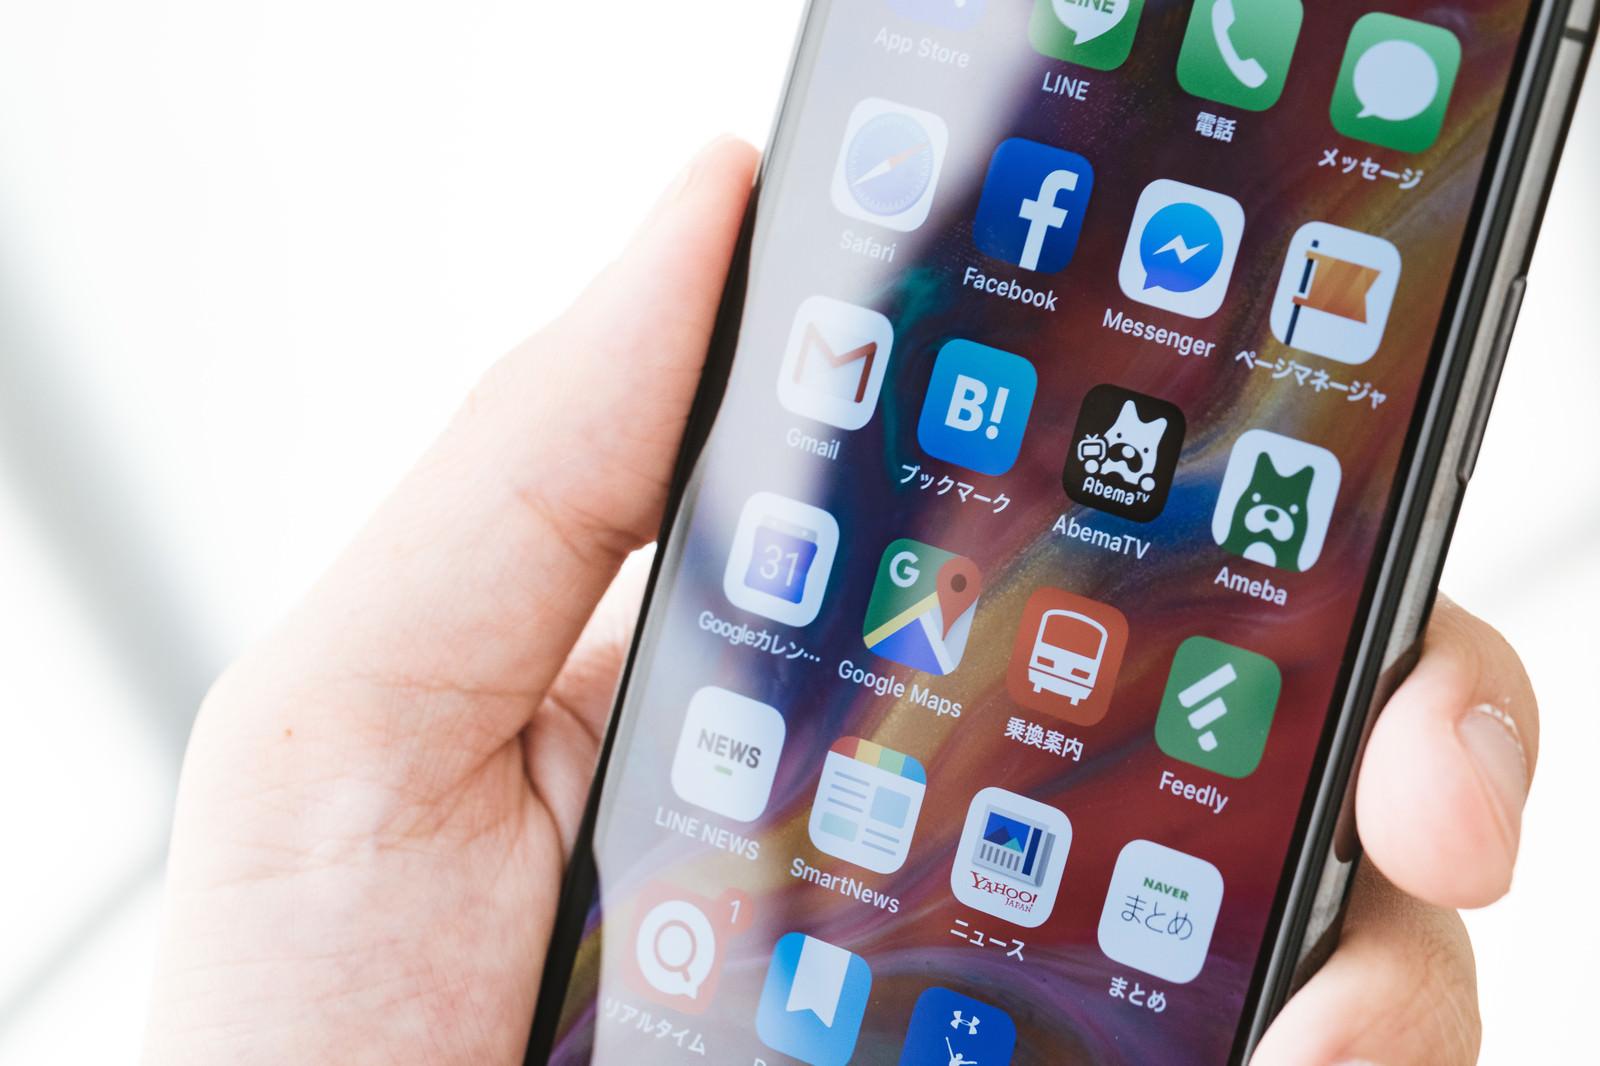 Smartphoneimgl4224 tp v